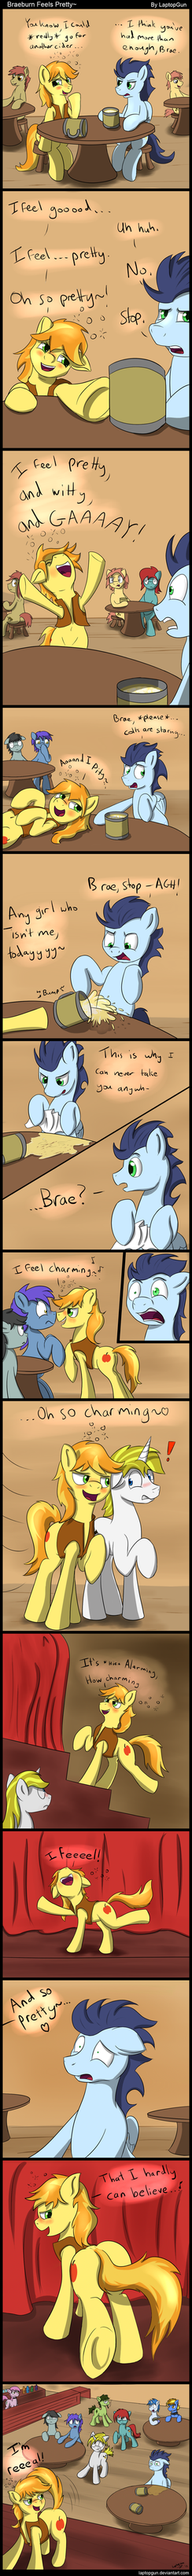 Braeburn Feels Pretty [Comic] by LaptopGun